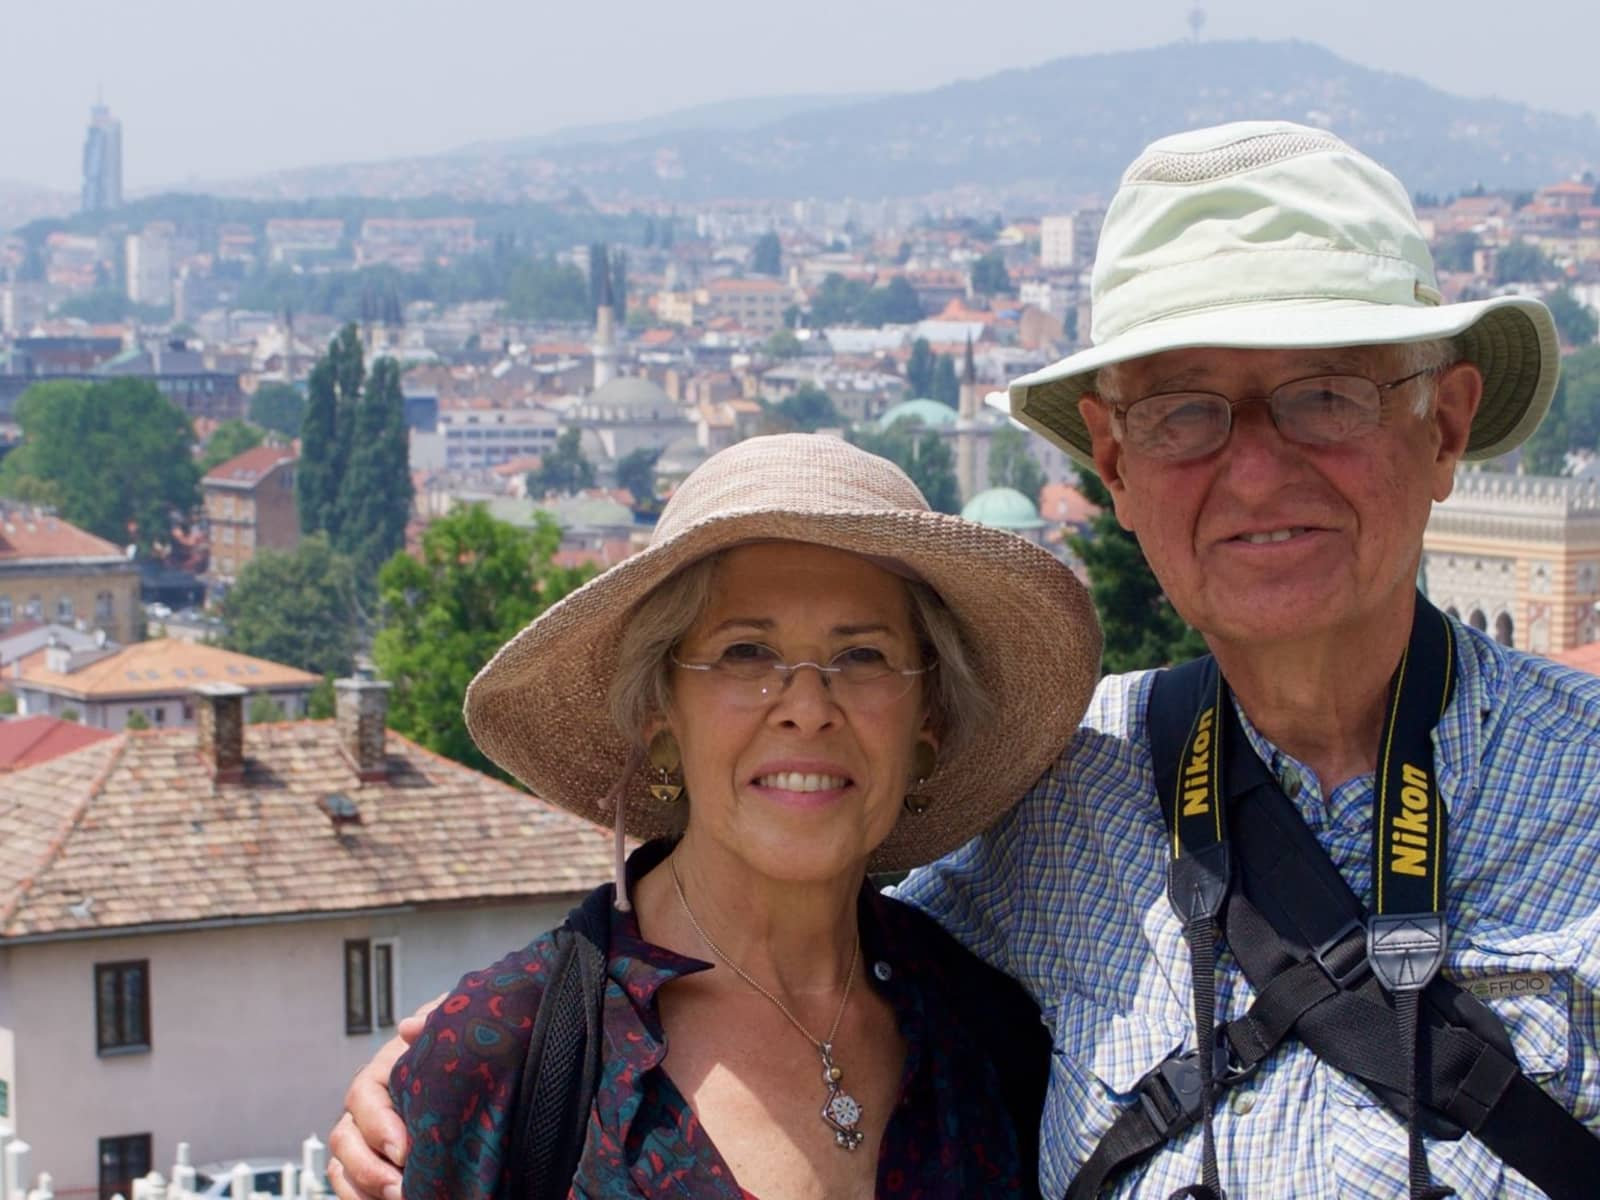 Marcia and michael & Michael from Tucson, Arizona, United States